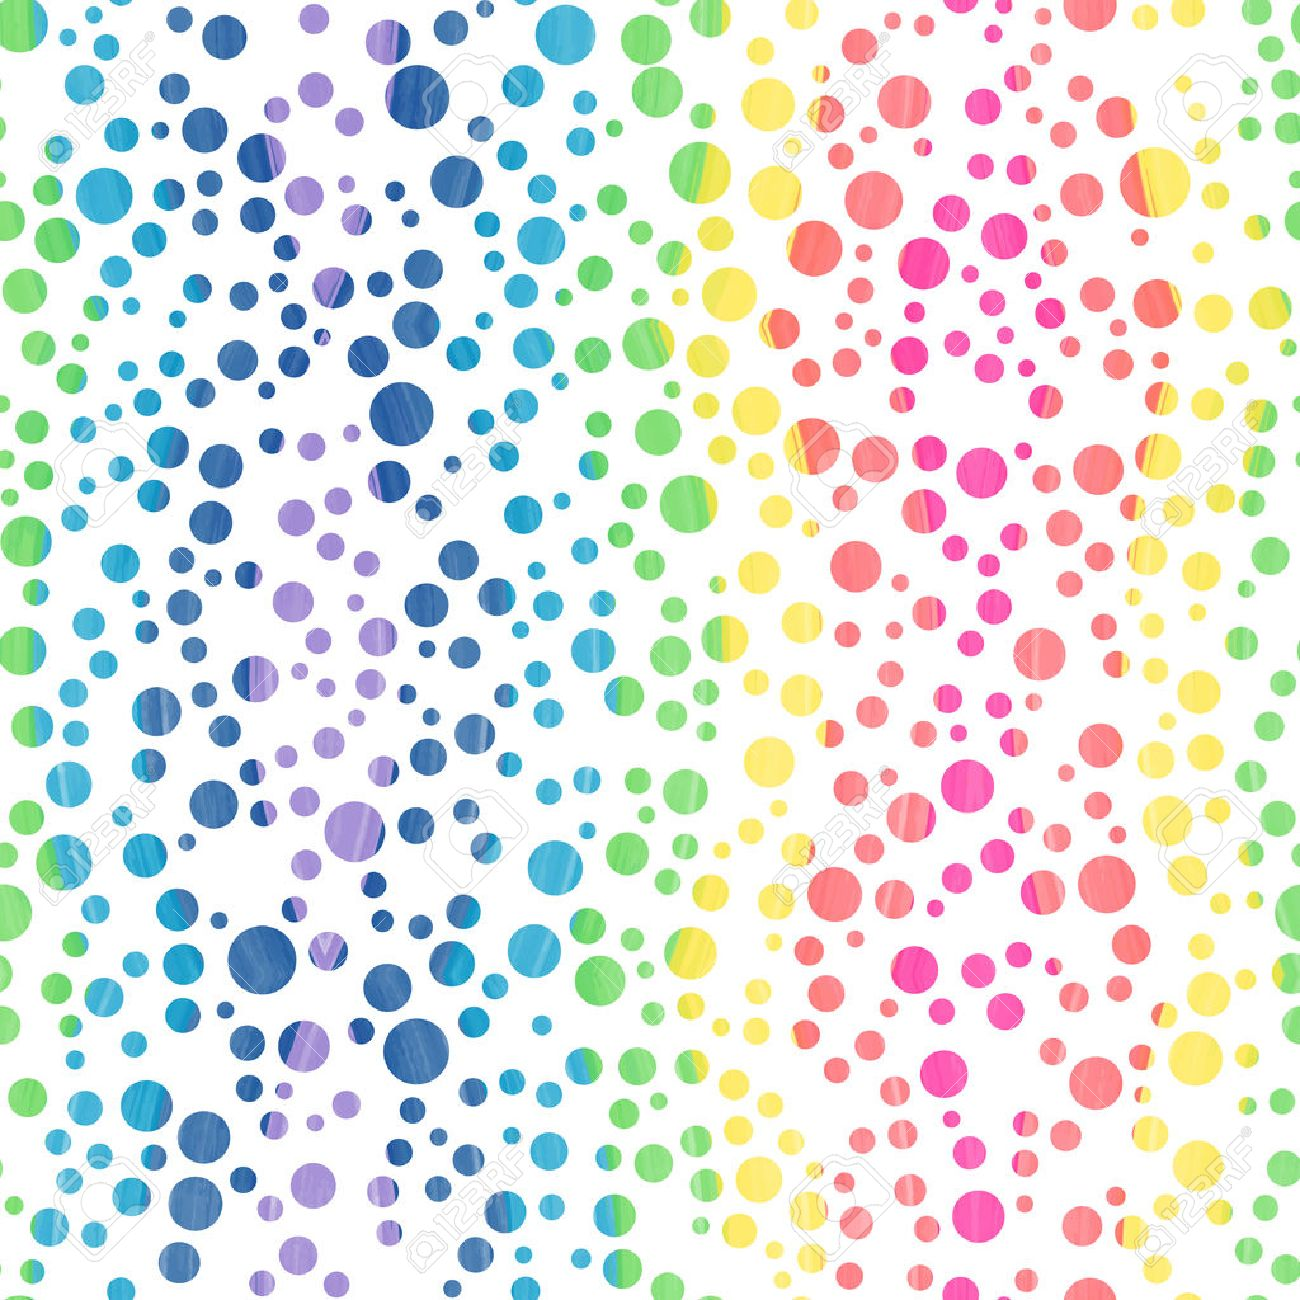 watercolor abstract seamless wallpaper colorful confetti classic